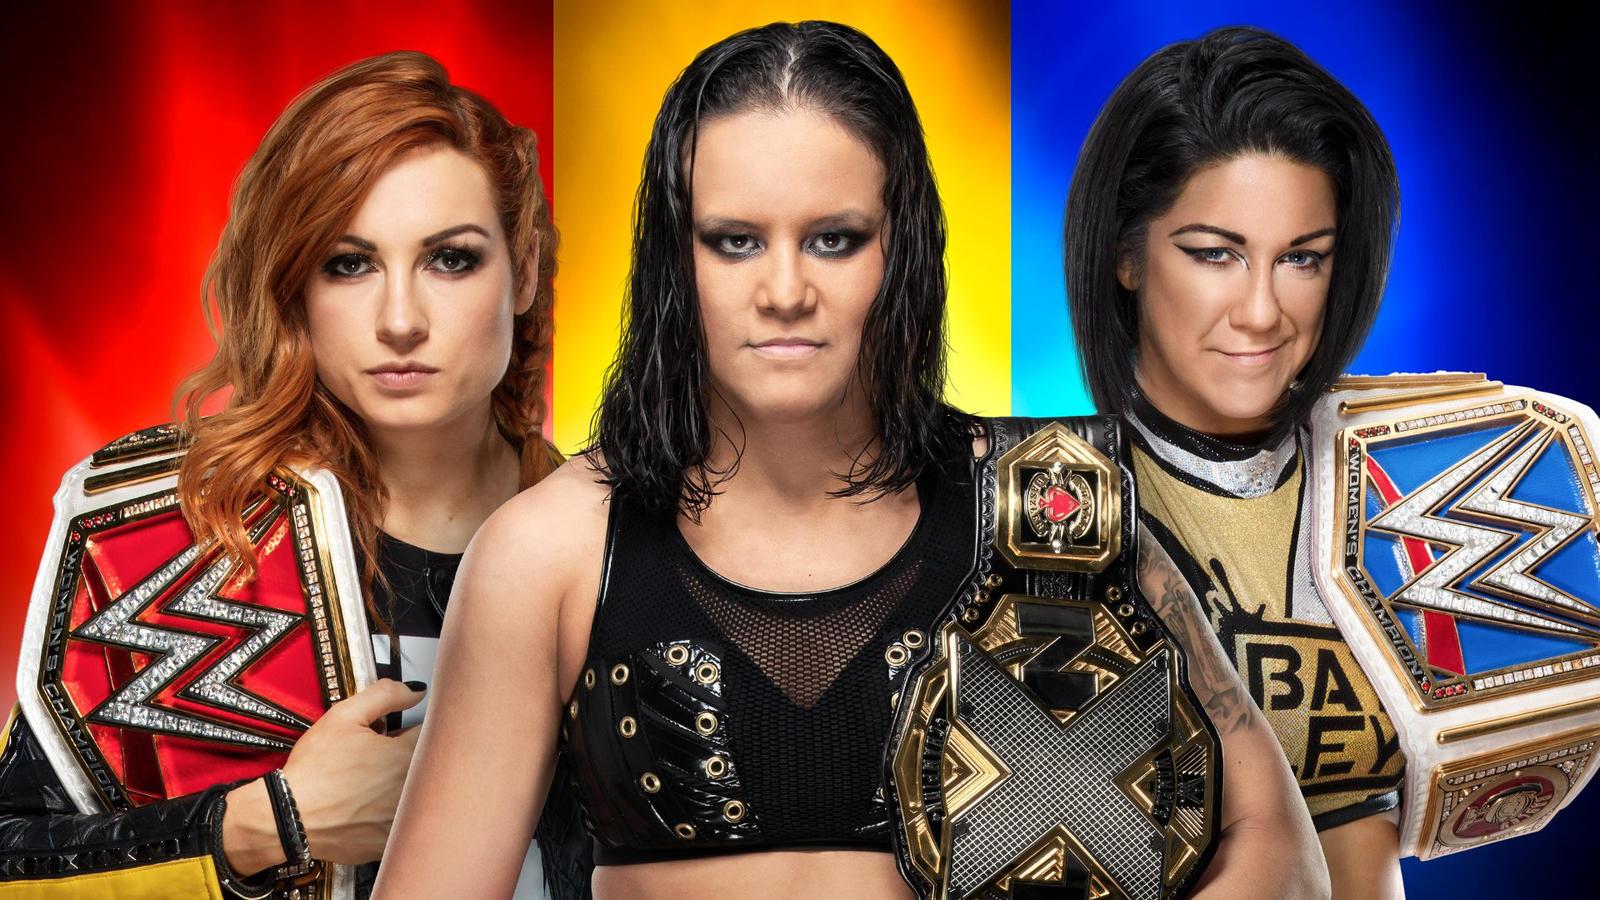 Raw Women's Champion Becky Lynch vs. SmackDown Women's Champion Bayley vs. NXT Women's Champion Shayna Baszler